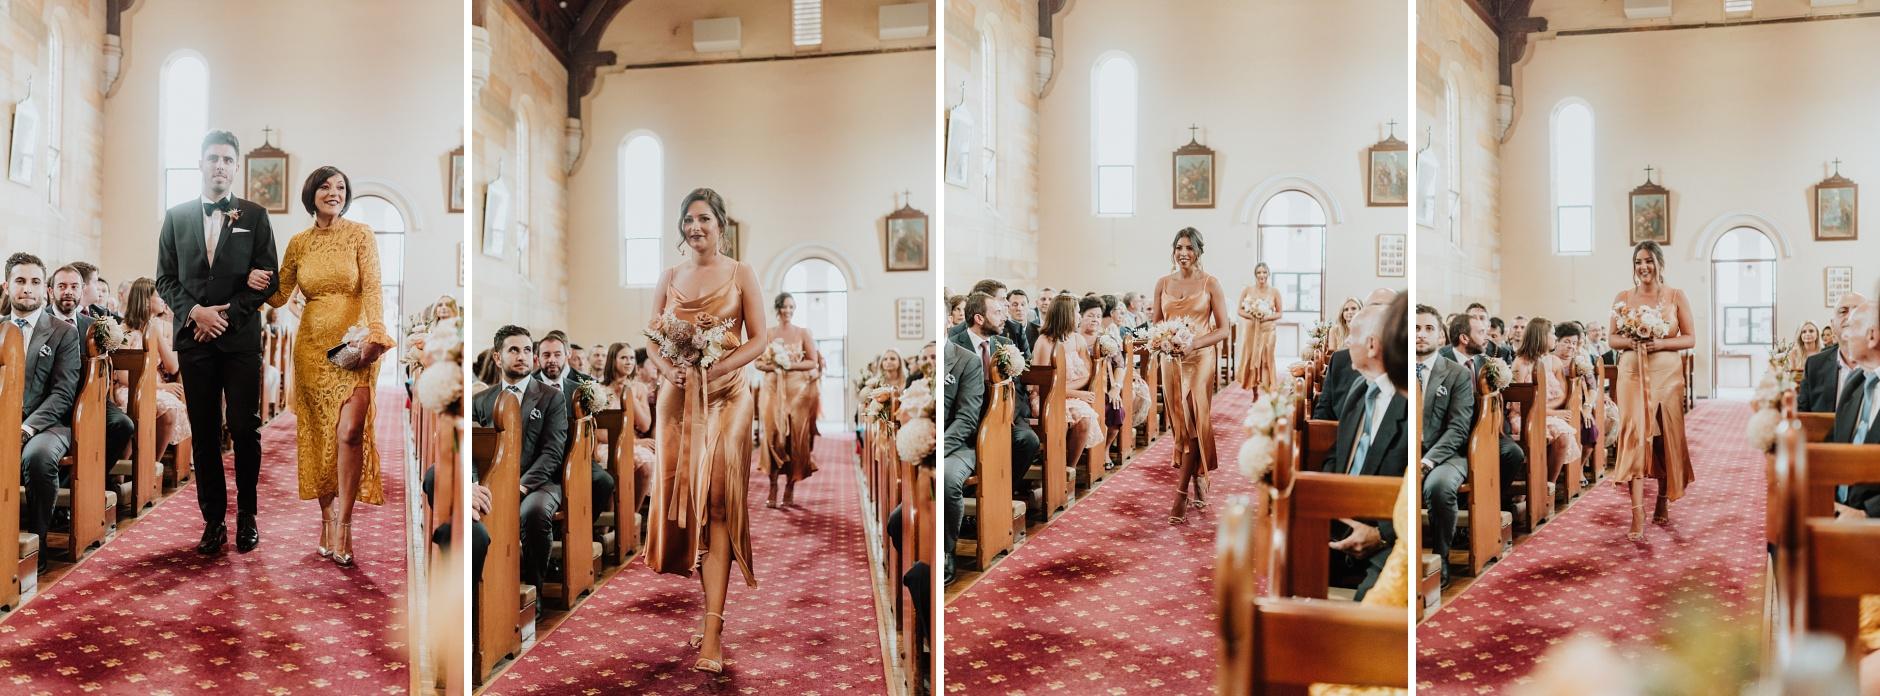 Sydney-Wedding-Photographer_0091.jpg